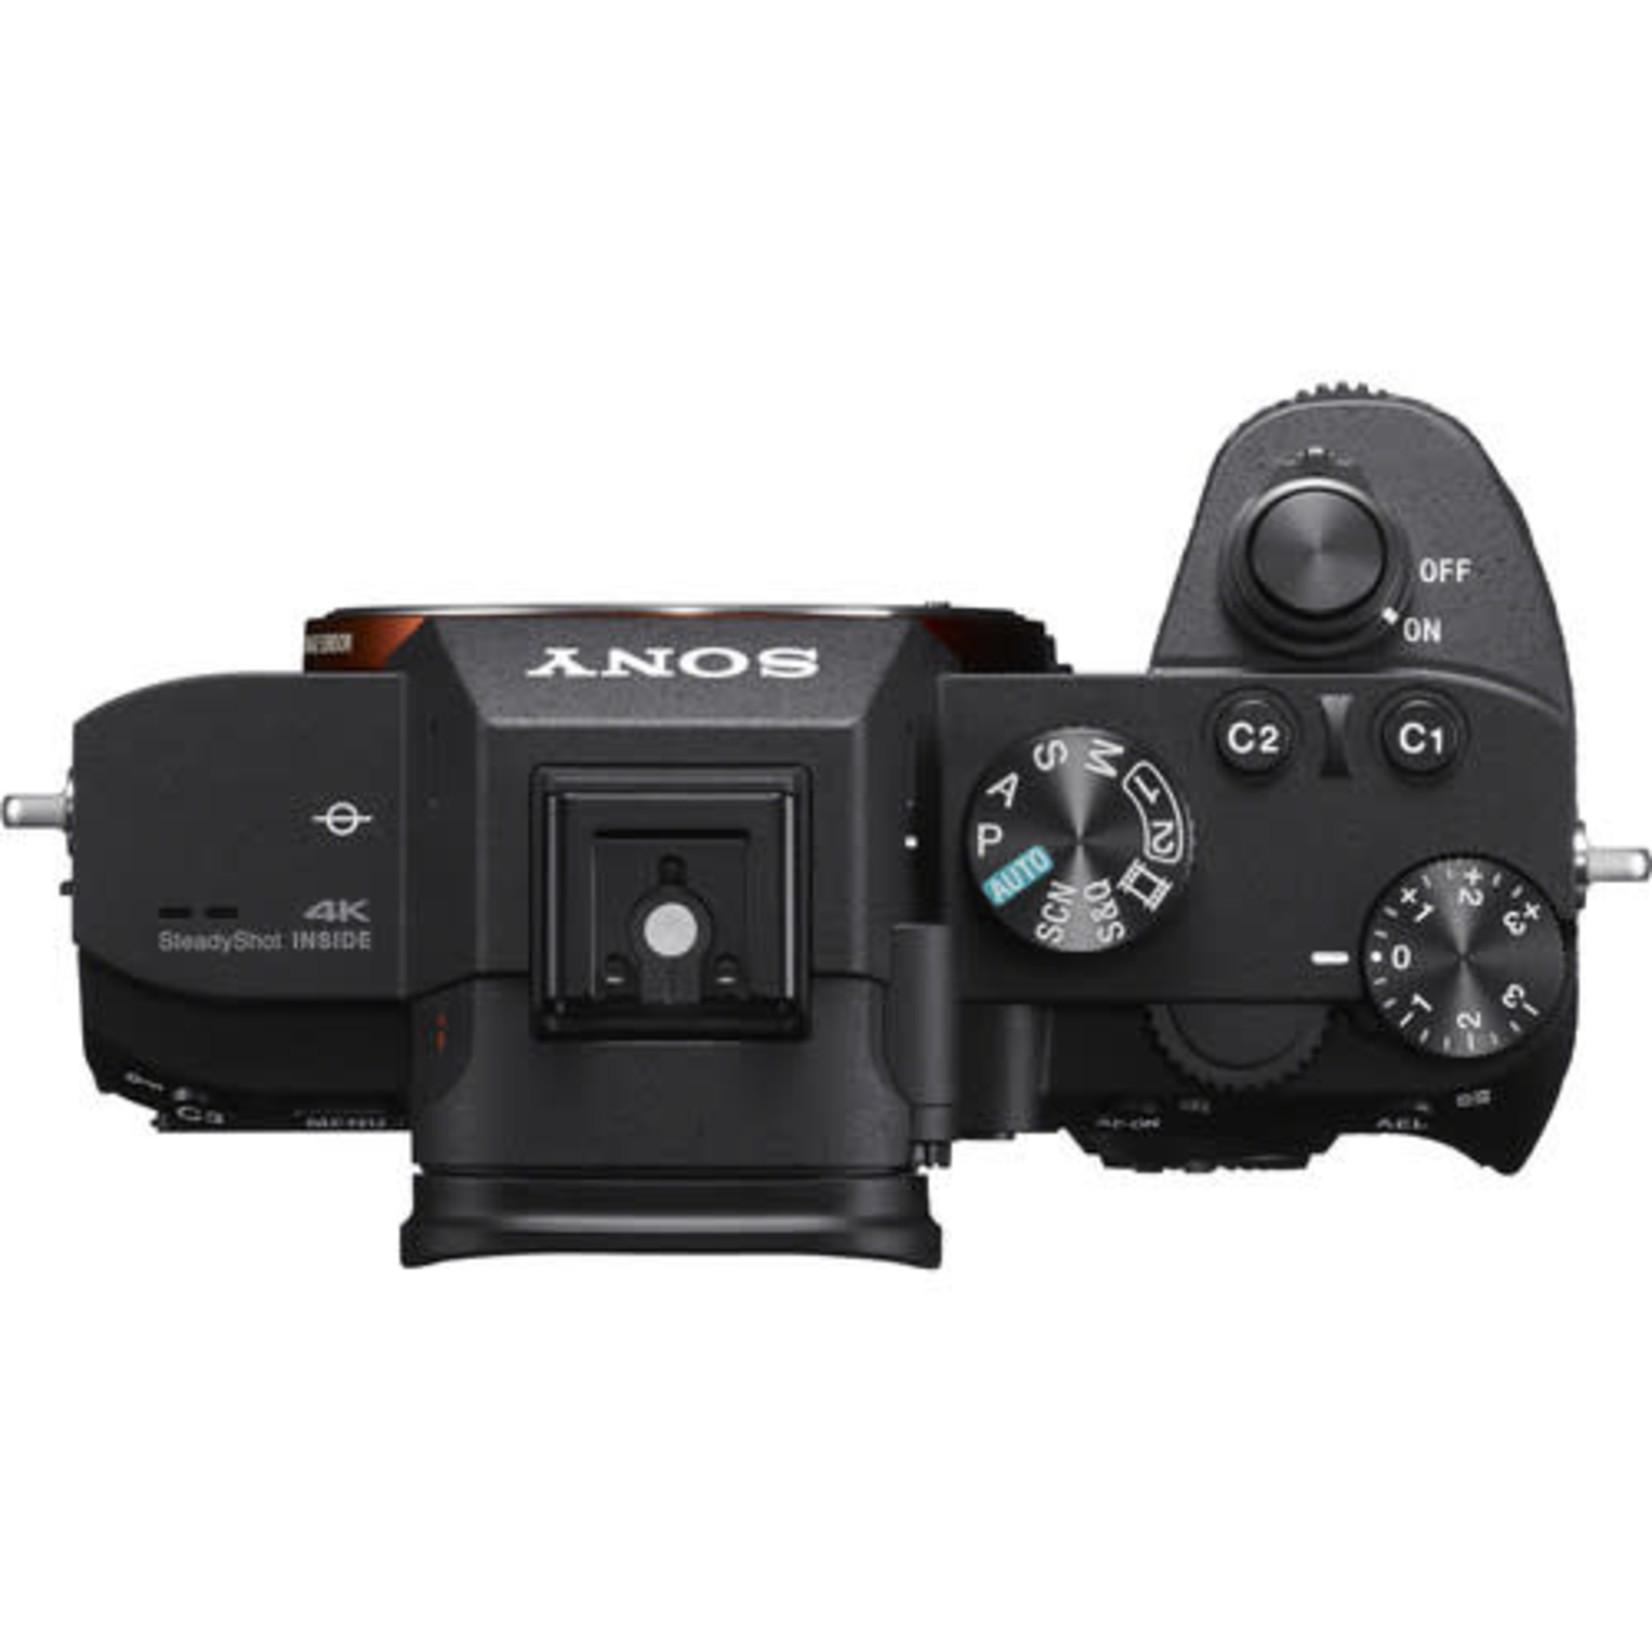 Sony Sony Alpha a7 III Mirrorless Digital Camera with 28-70mm Lens